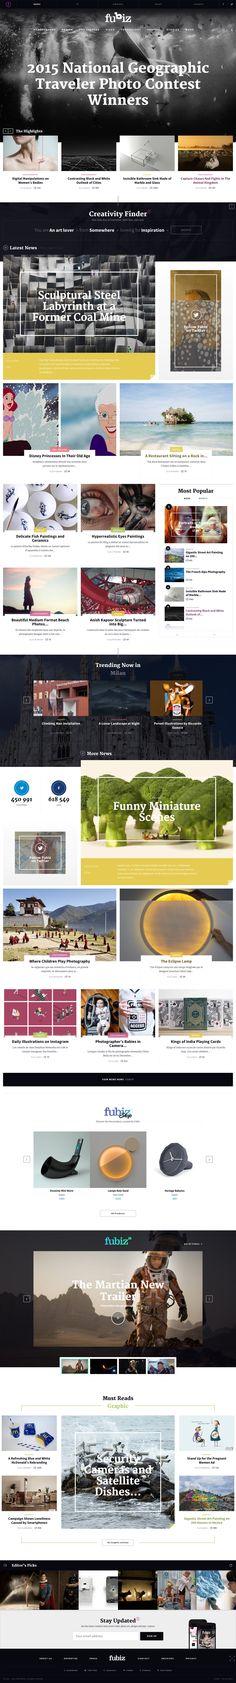 Web Layout Design UI UX Flat Design Modern Design Big Photo Web Development Trends WordPress Web Design, Modern Design, Web Layout, Layout Design, Photo Web, Web News, Mobile Design, Interactive Design, Exterior Design